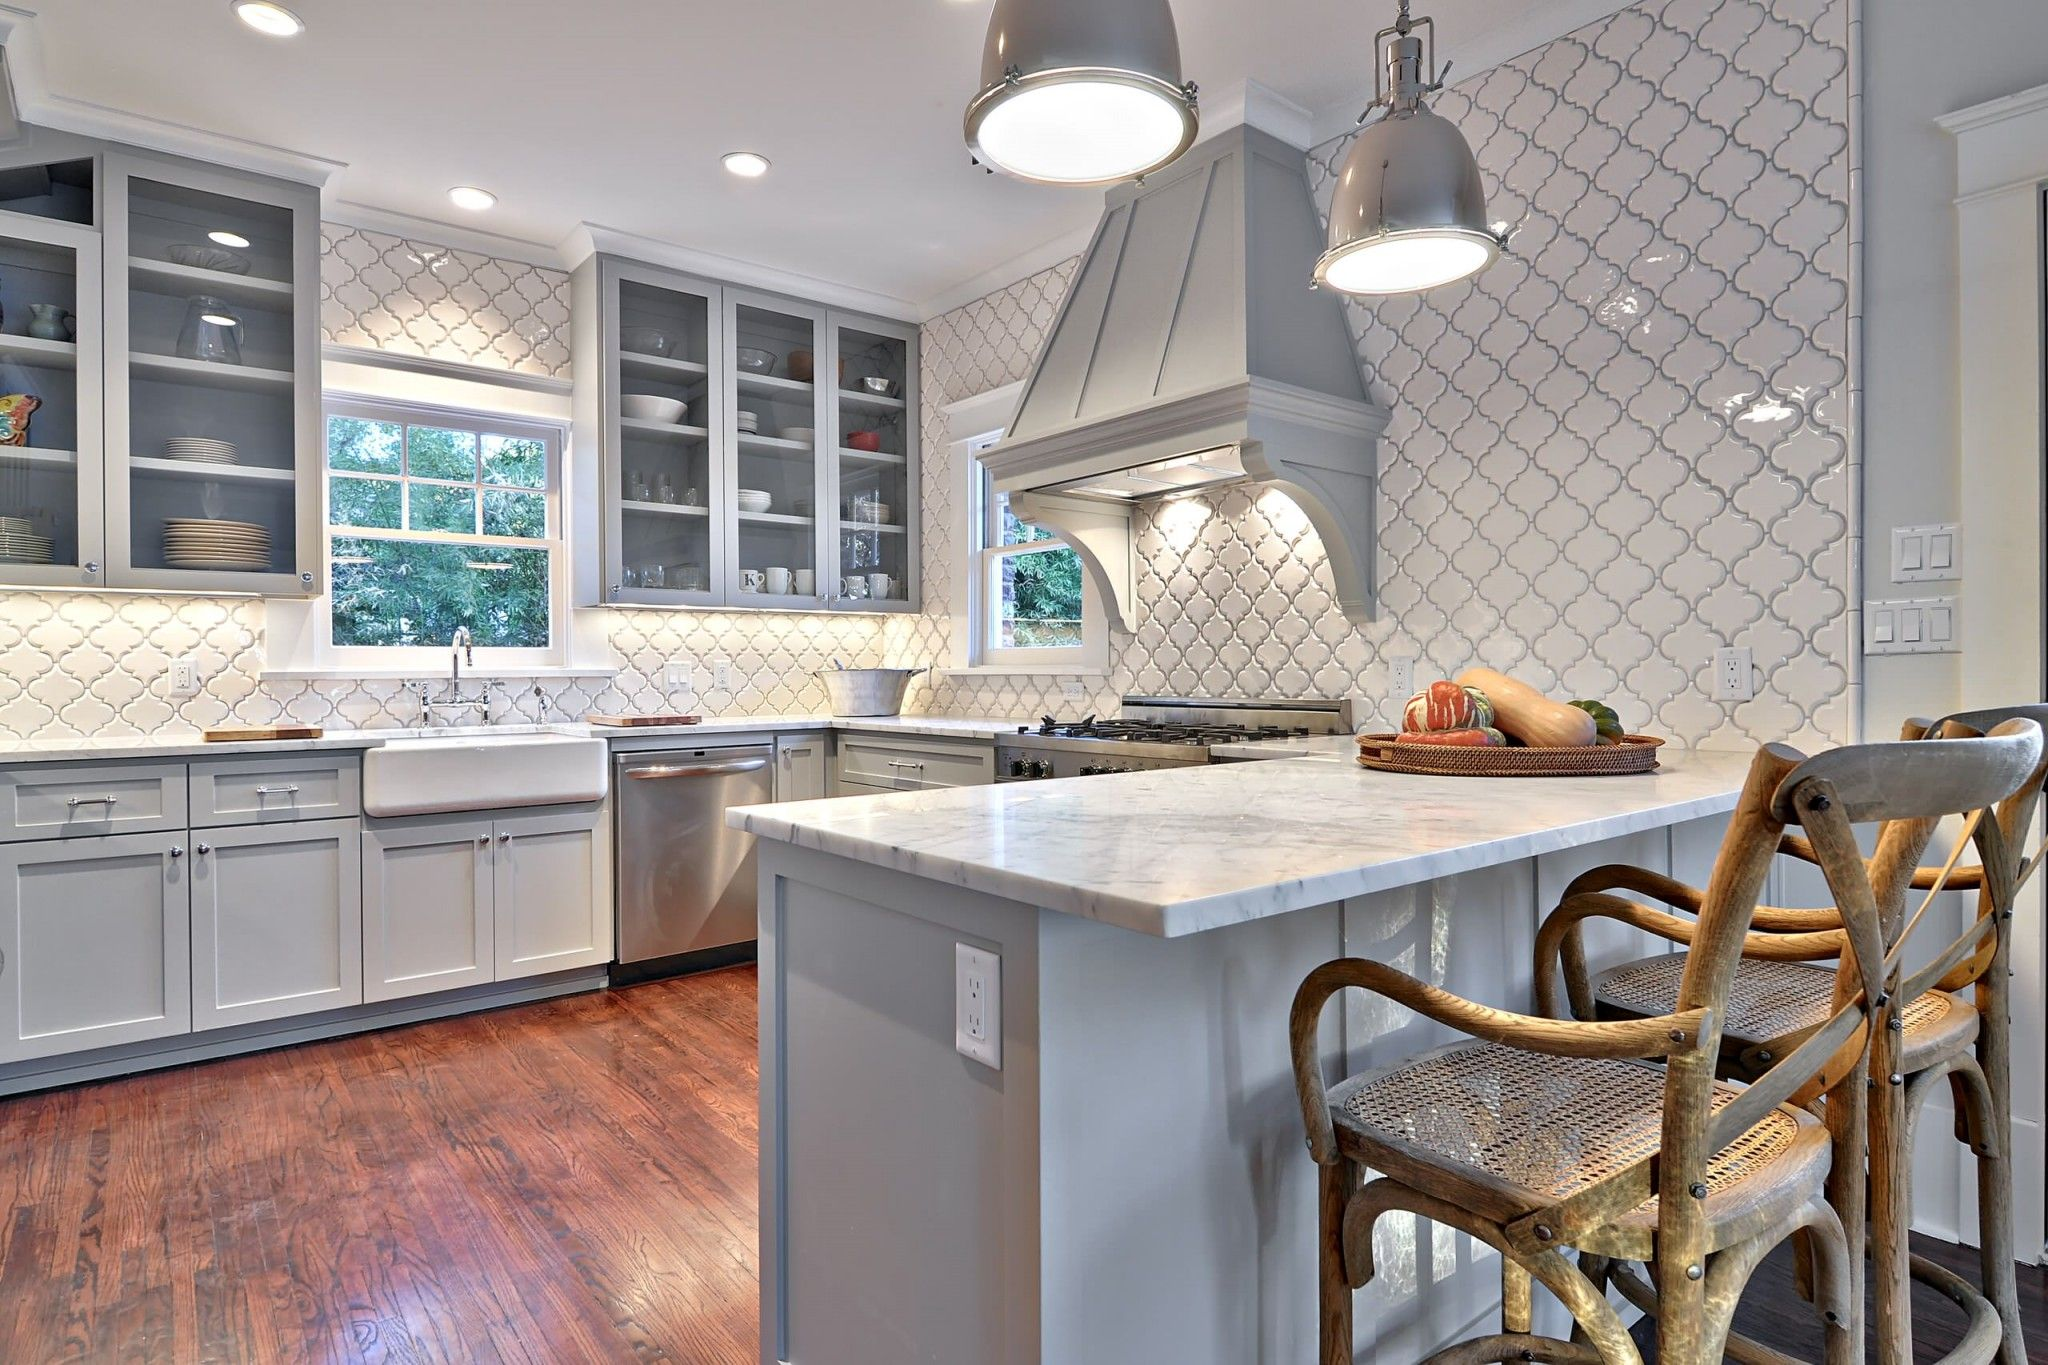 Kitchen Tiles & Furniture Color Combination. Basic Rules